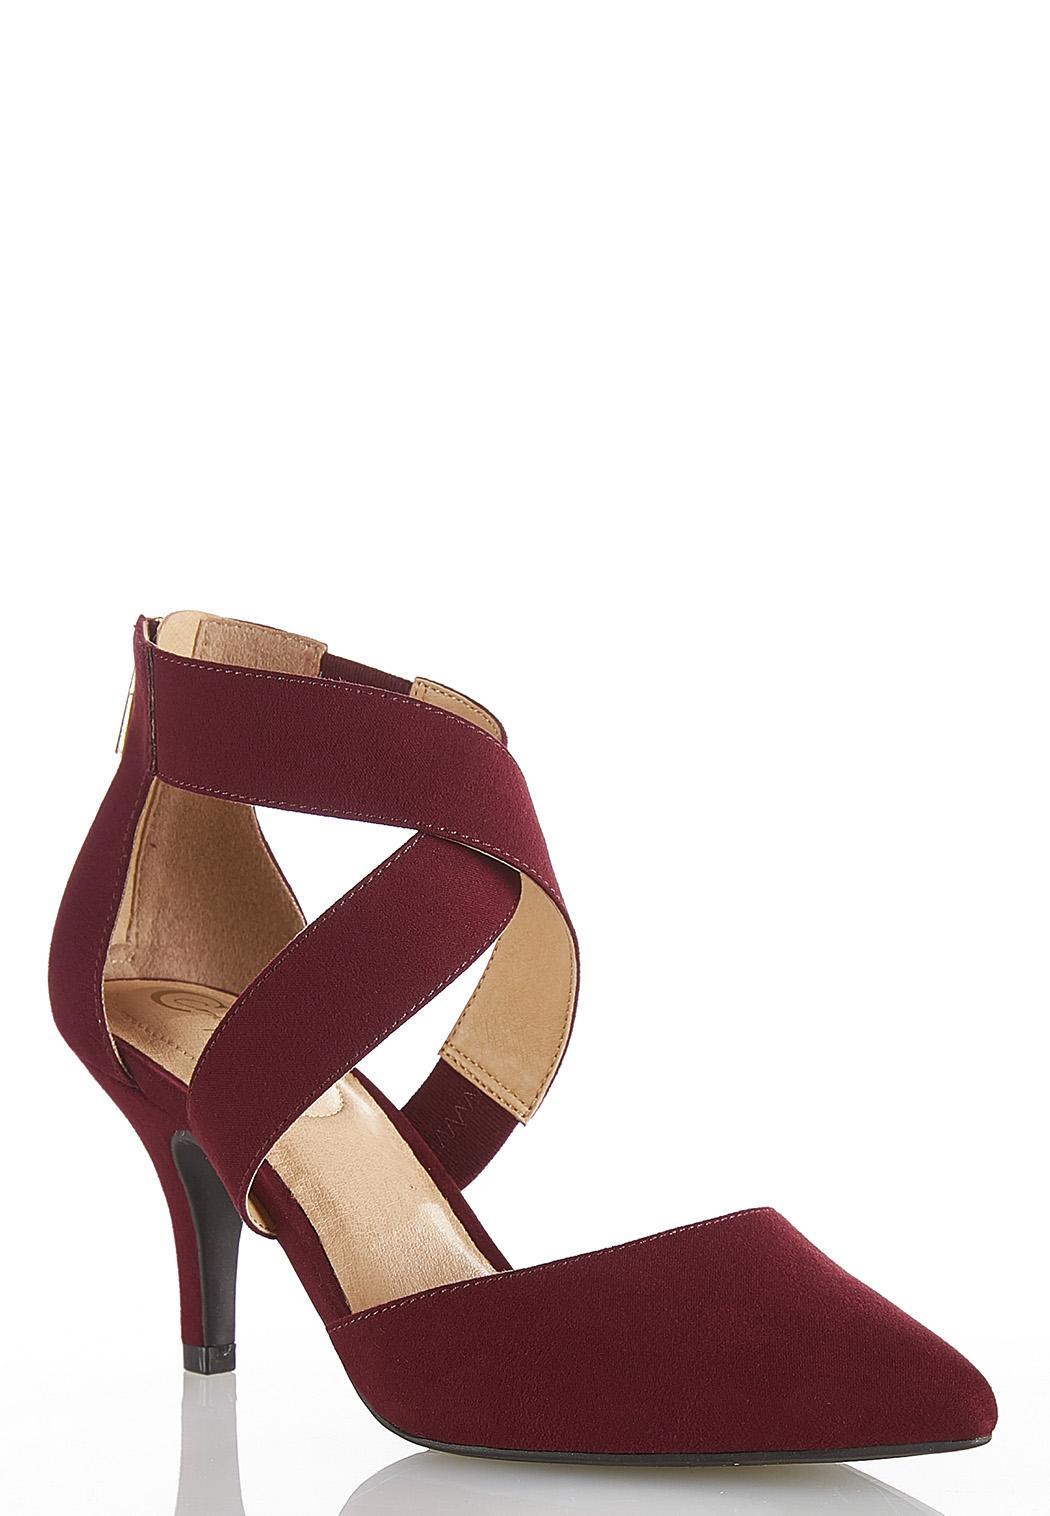 33b60c622 Women's Shoes - Boots, Heels, Flats & More | Cato Fashions